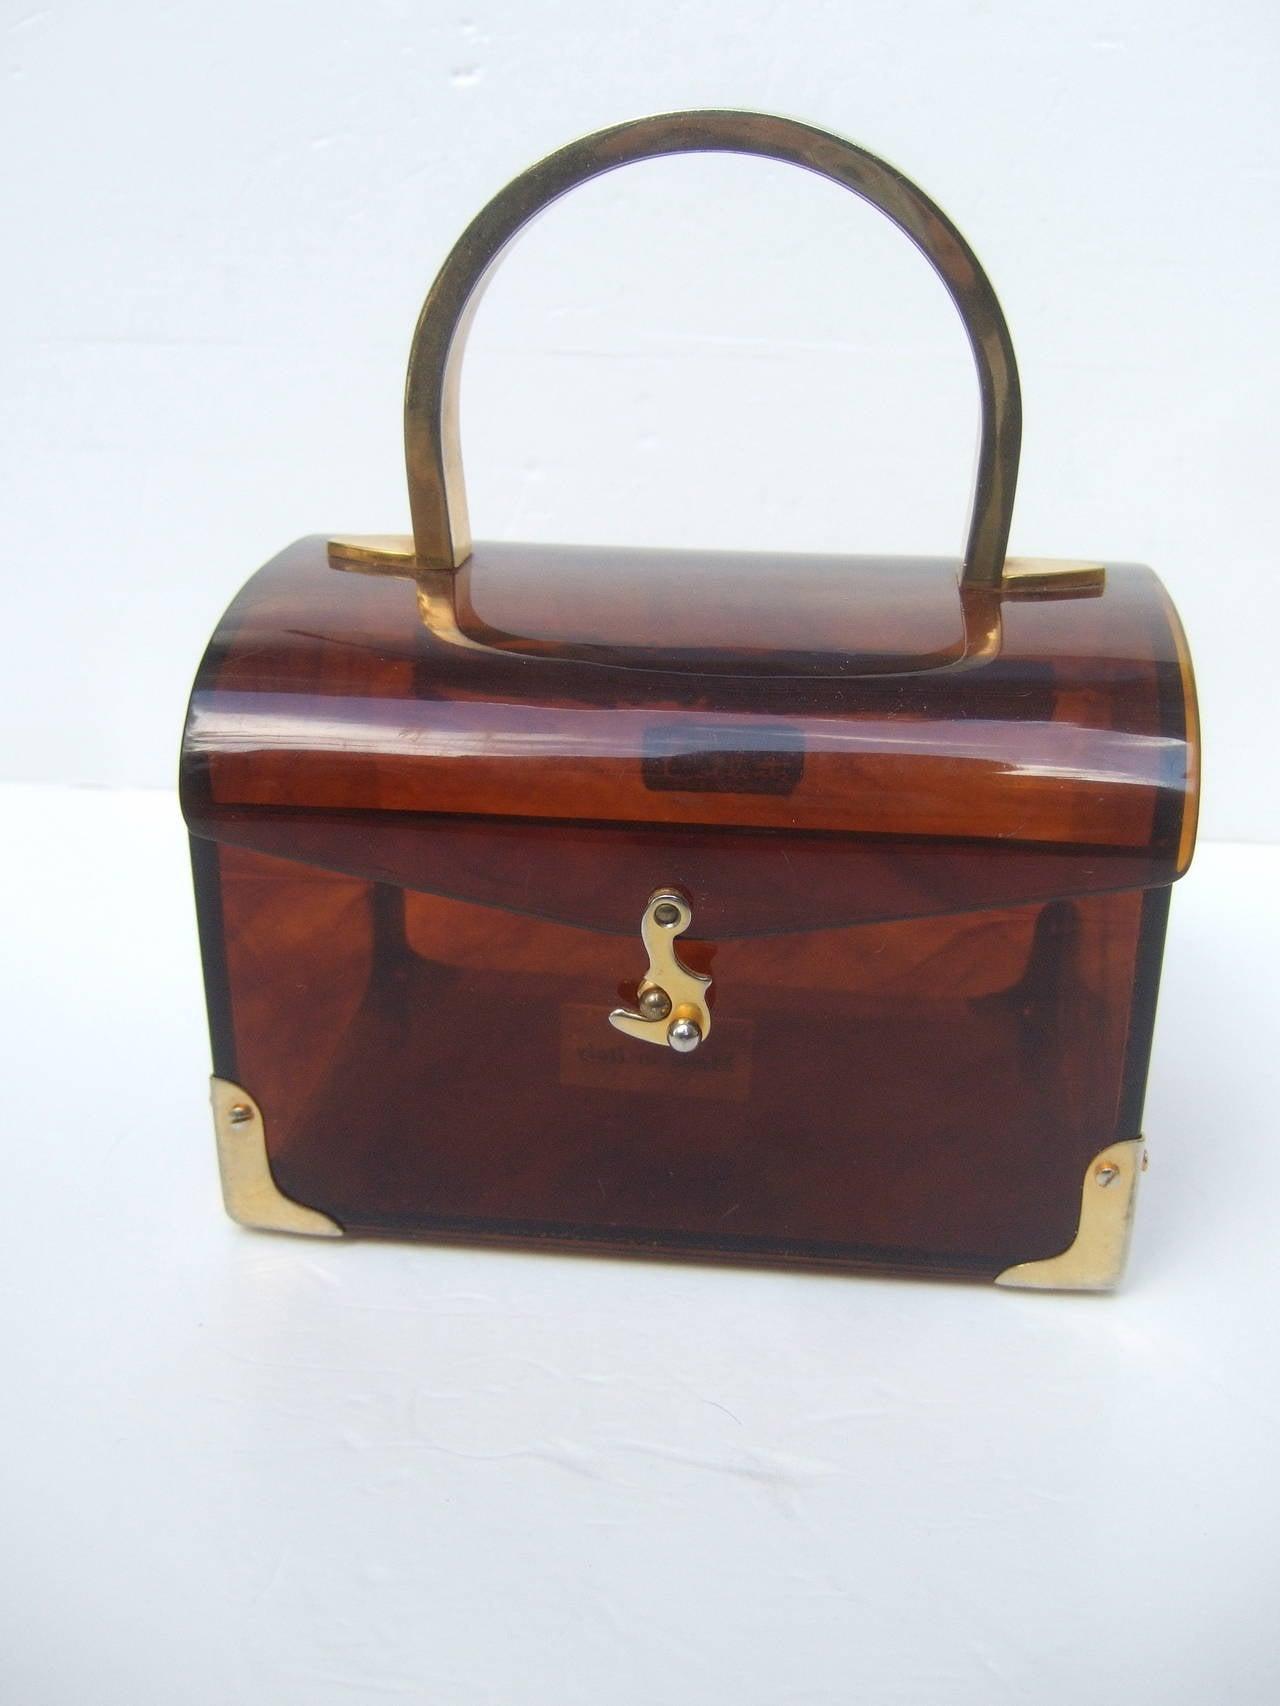 Stylish Lucite Tortoise Shell Handbag Made In Italy For